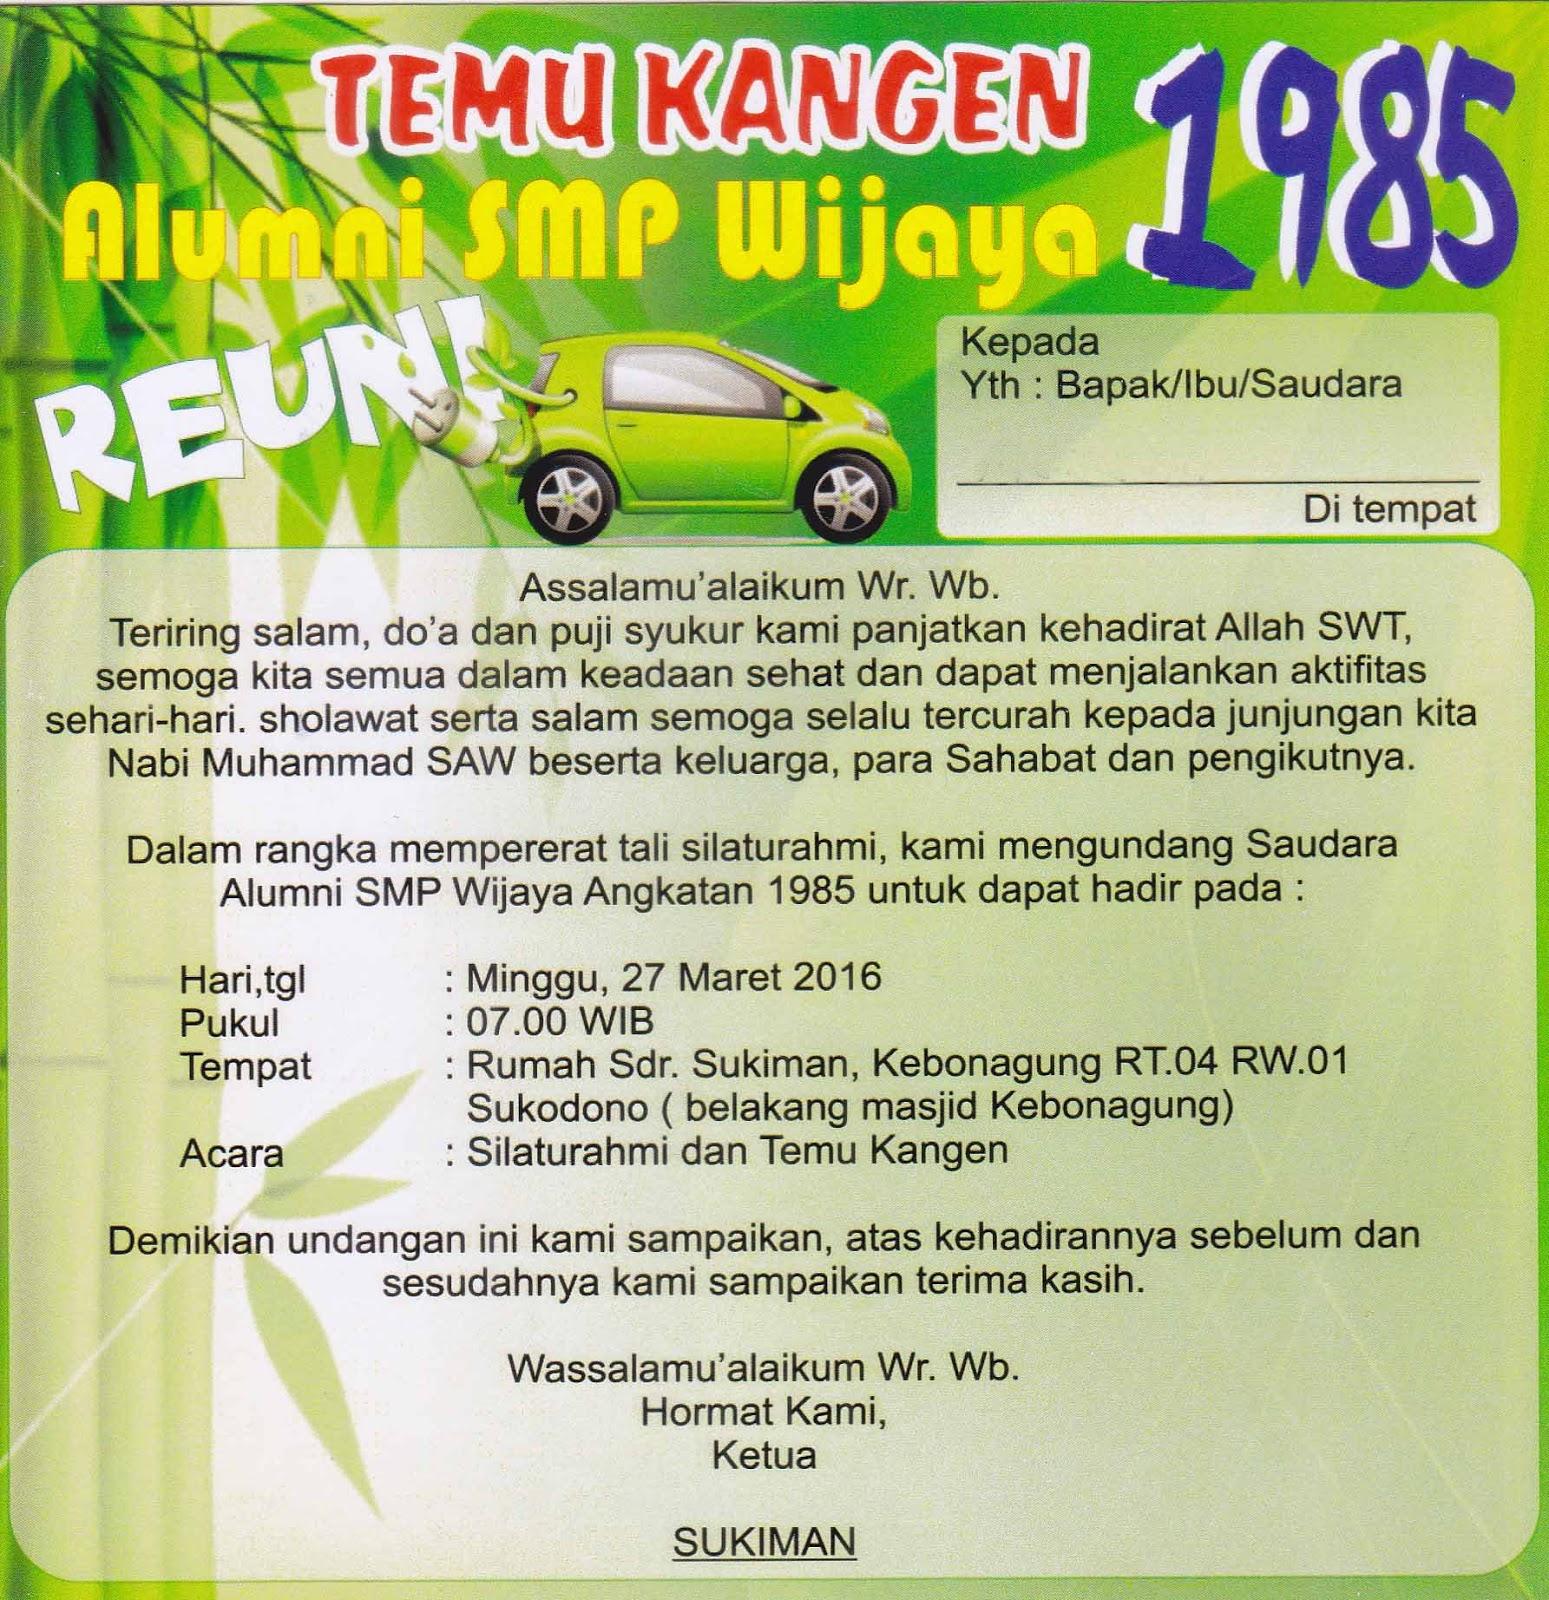 Undangan Reuni Alumni Smp Wijaya Sukodono Tahun 1985